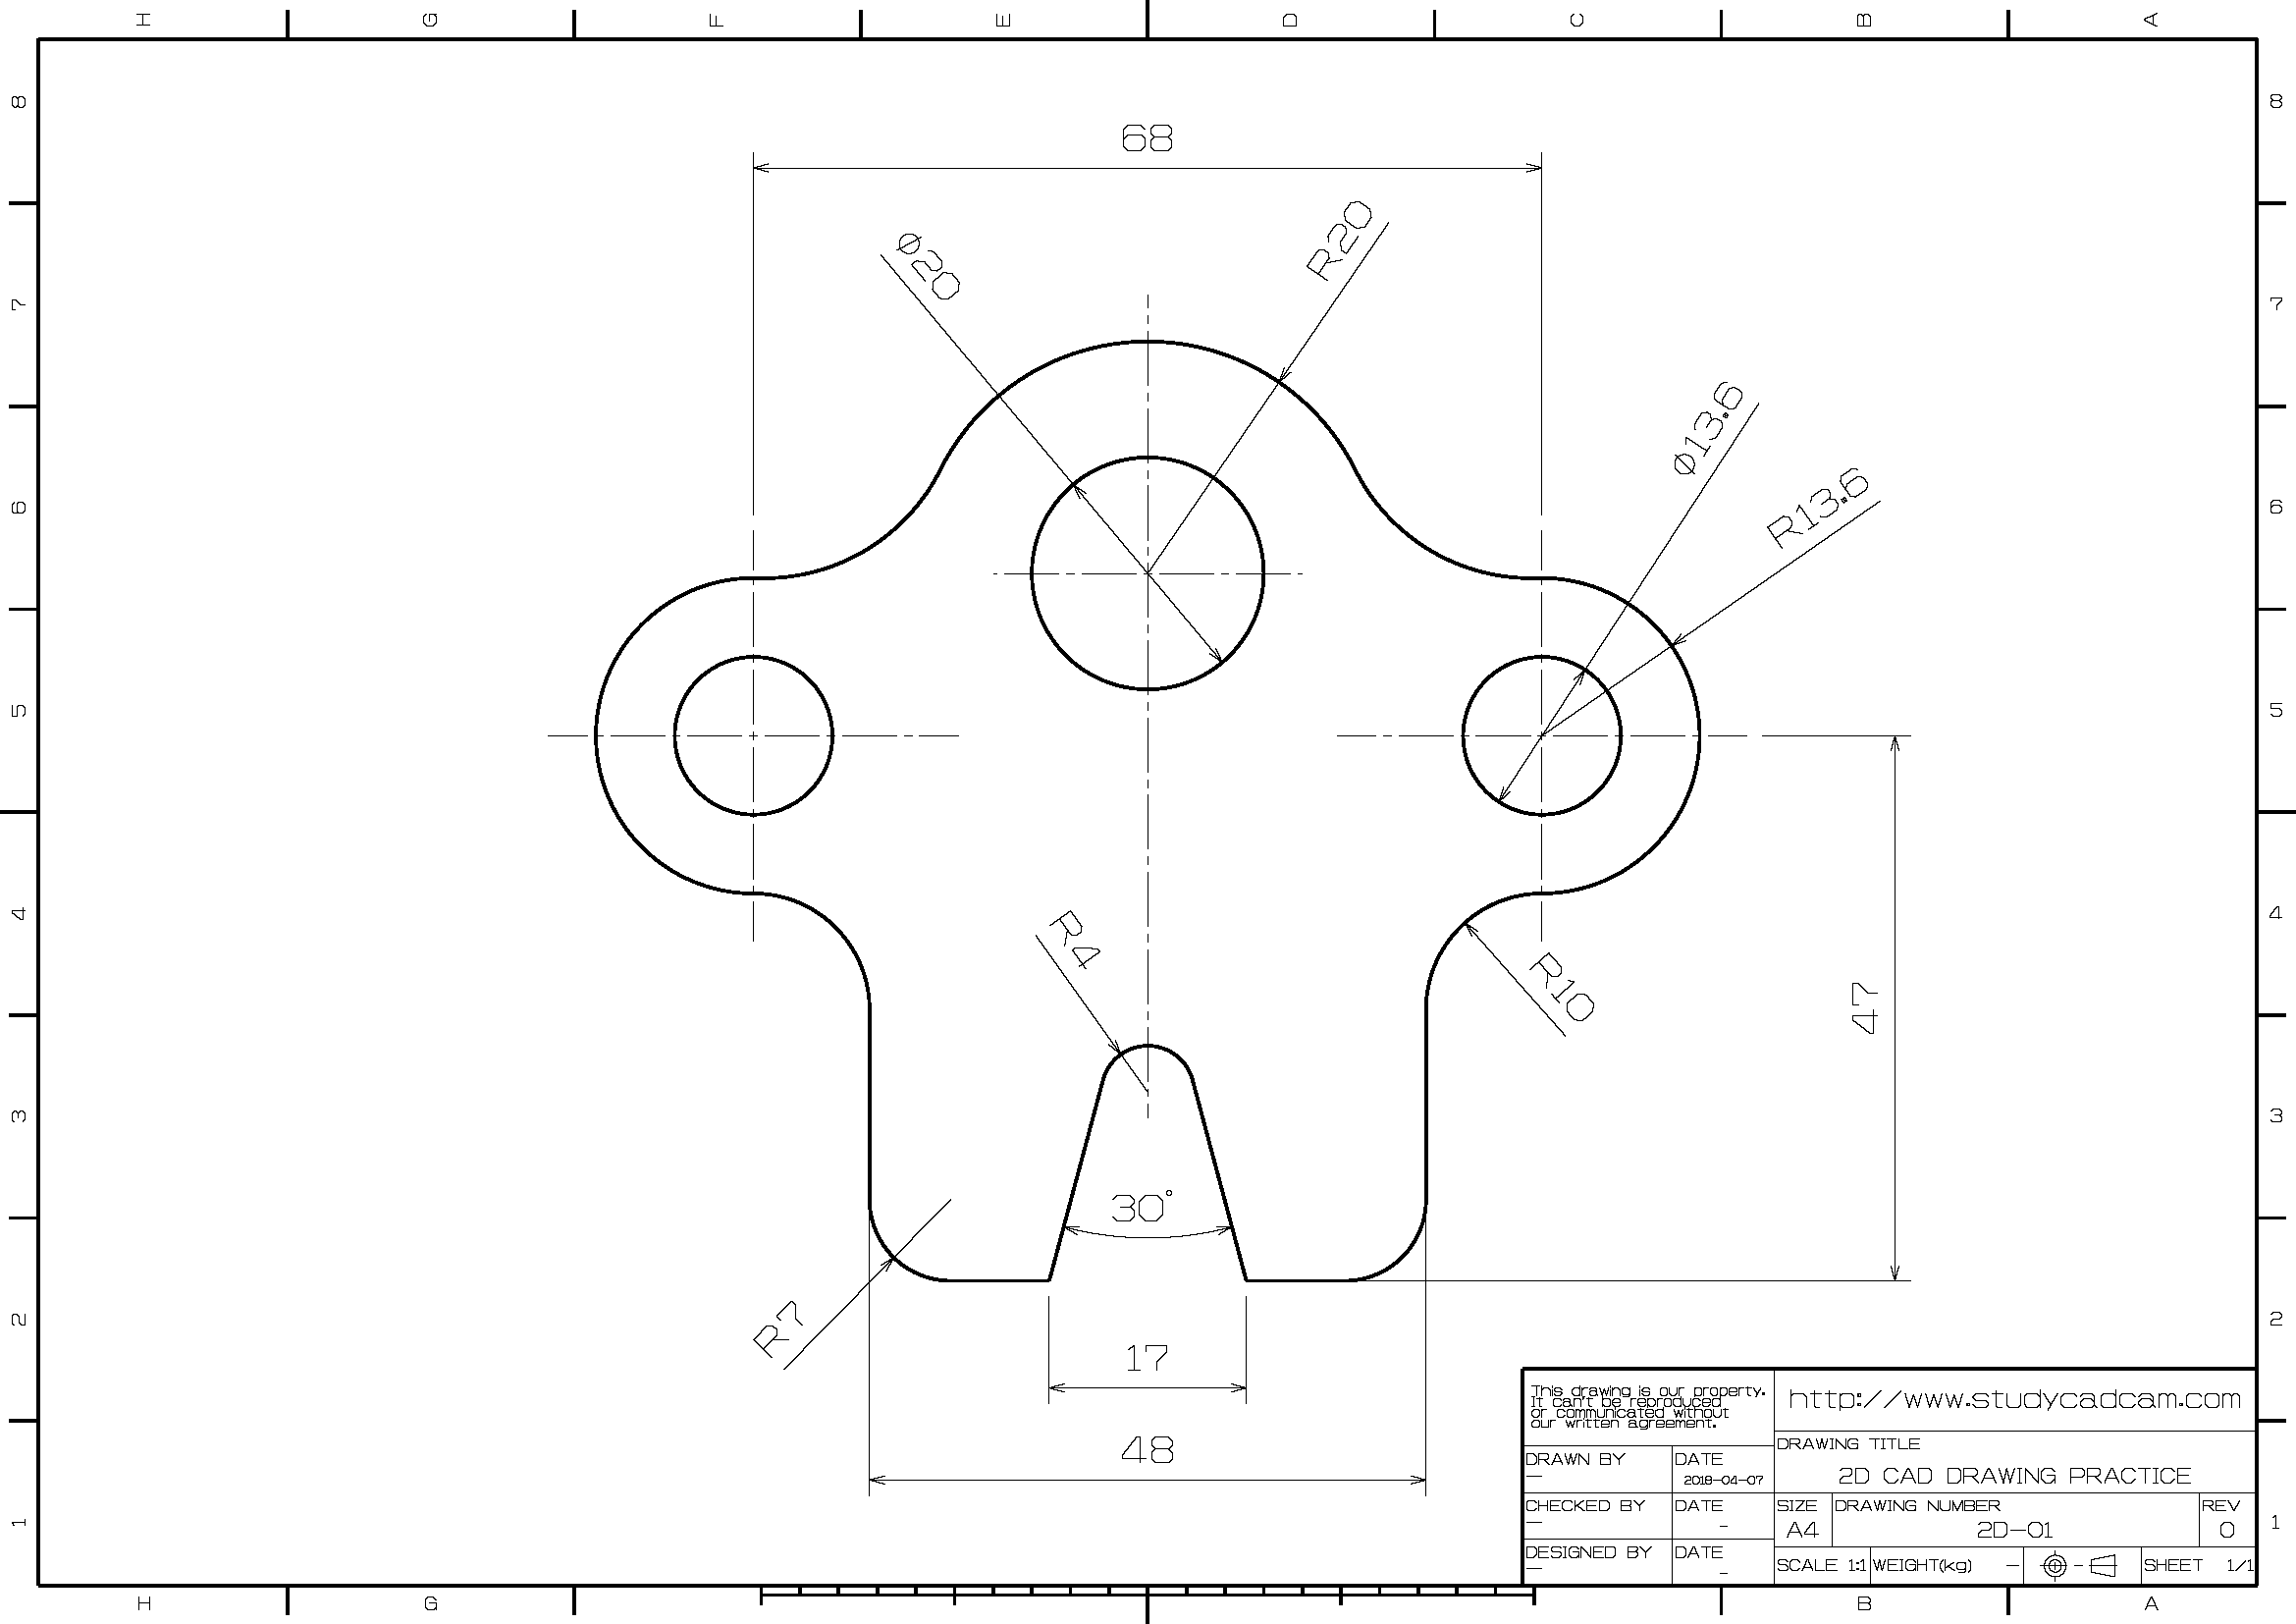 Pin De Claudia Ramirez En 2d Dibujo Tecnico Ejercicios Tecnicas De Dibujo Dibujo Lineal